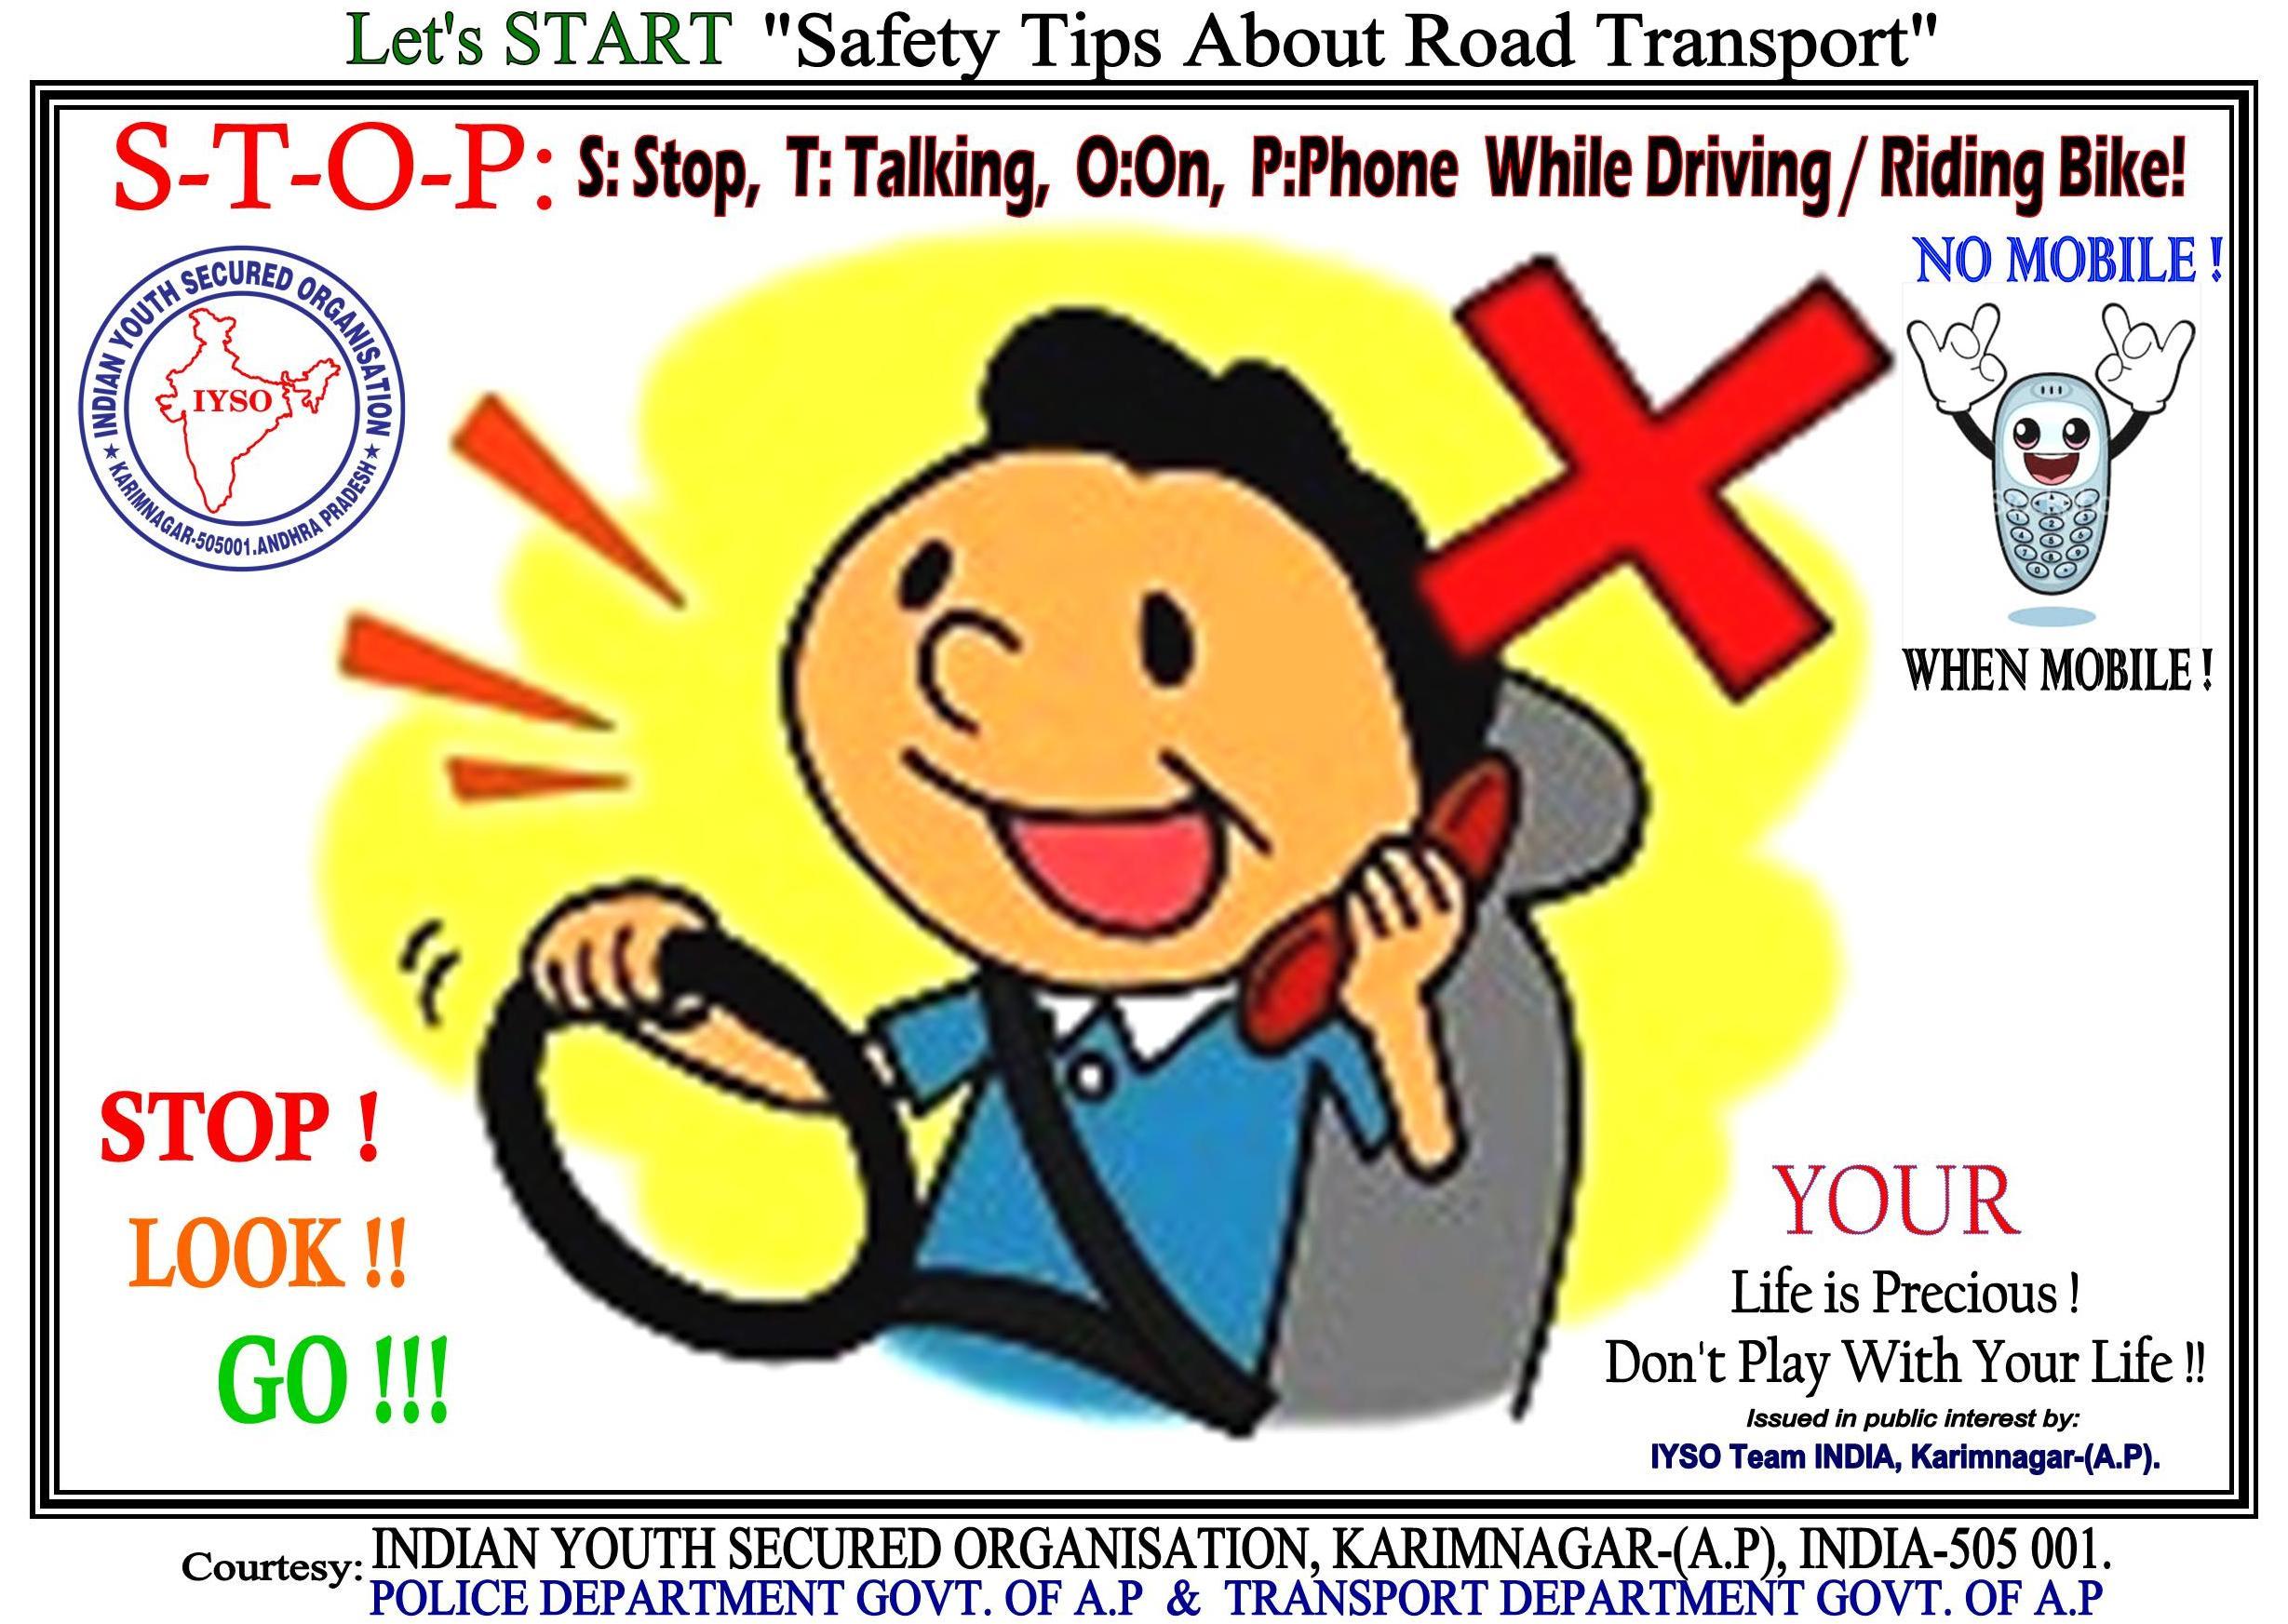 Lets START Safety Tips About Road Transport Regarding